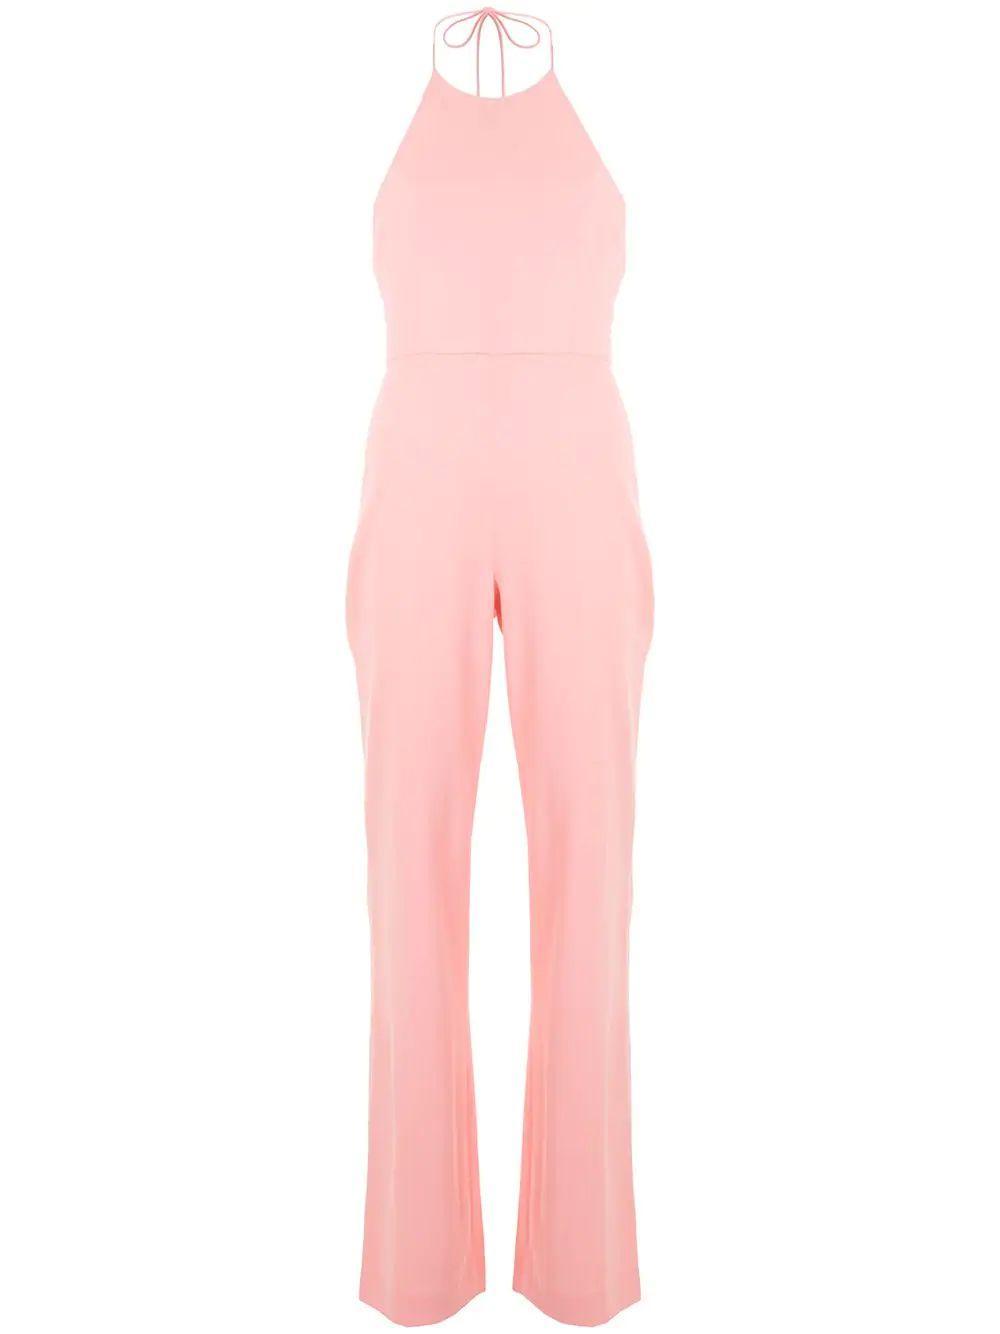 Adinah Neck Sleeveless Jumpsuit Item # CC005202805